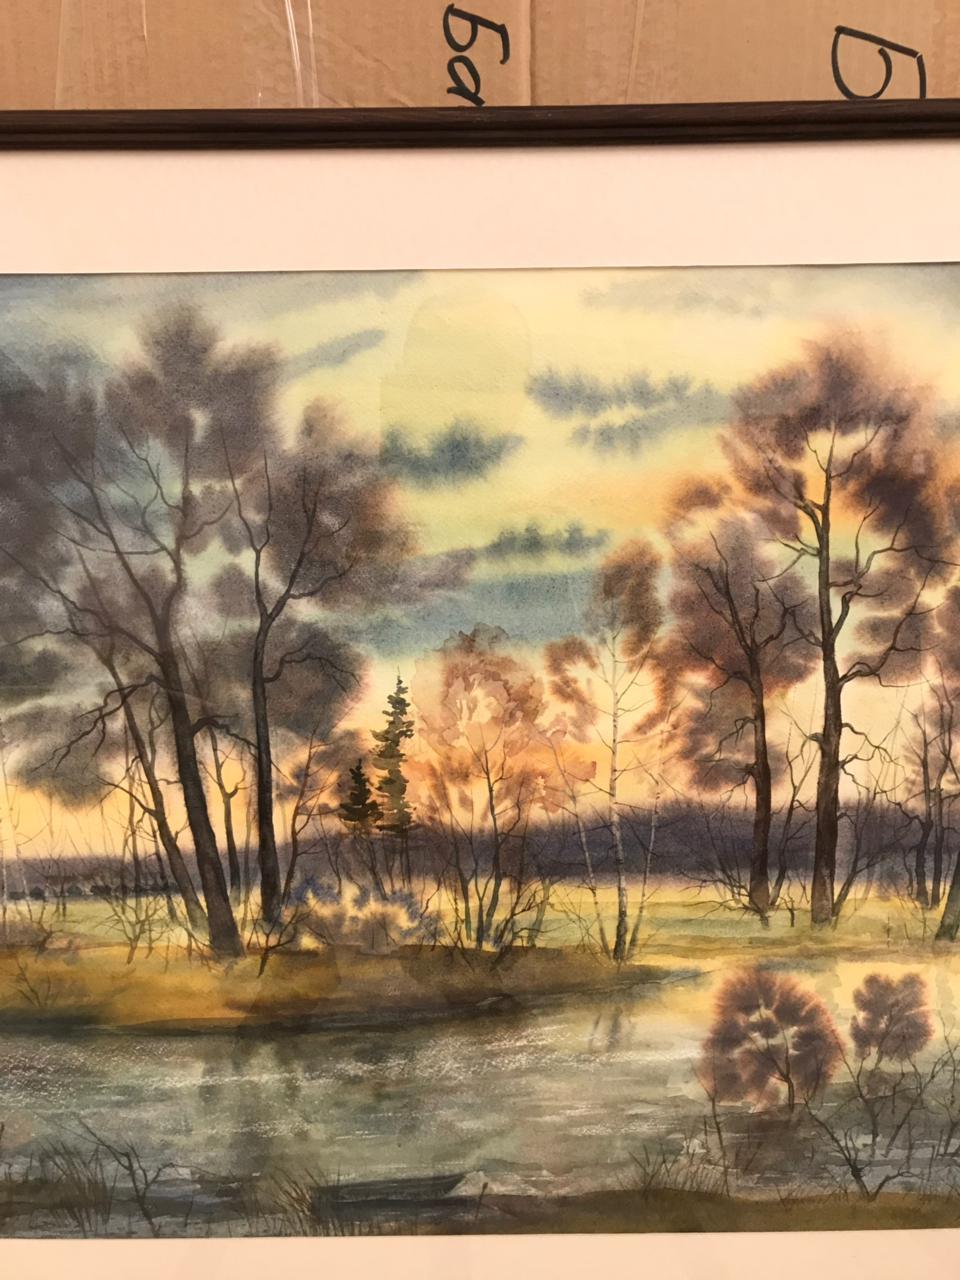 Картины башкирского художника Юлая Басареева